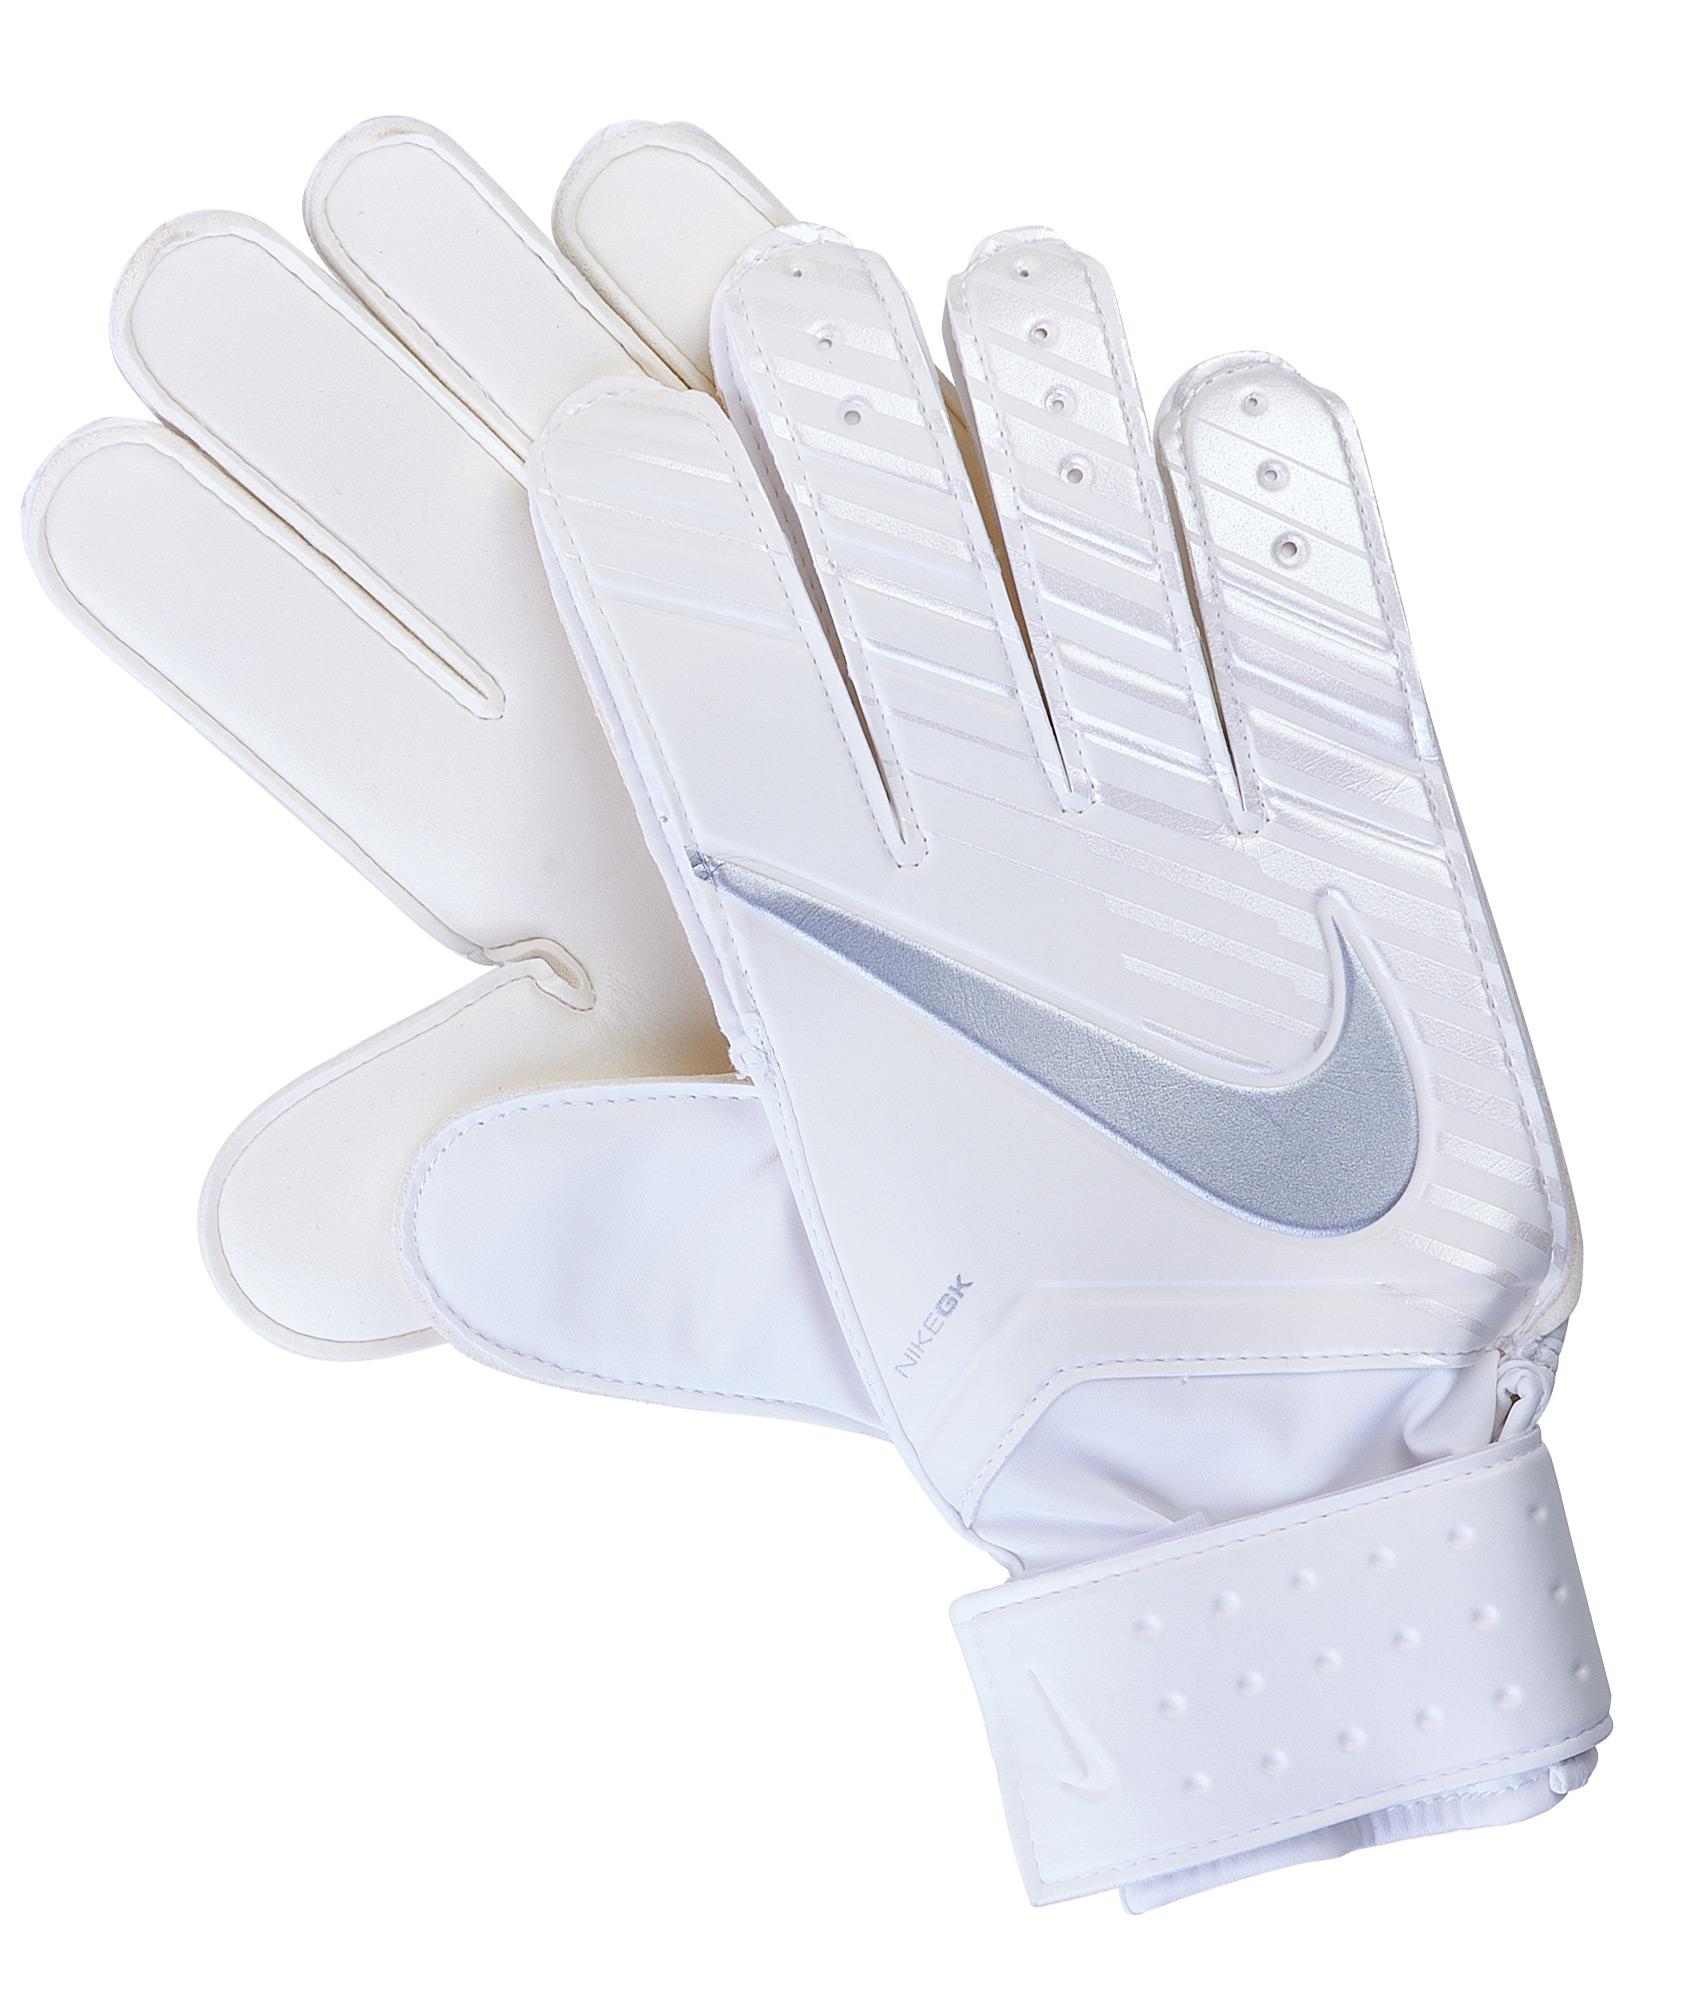 Перчатки вратарские Nike Nike Цвет-Белый